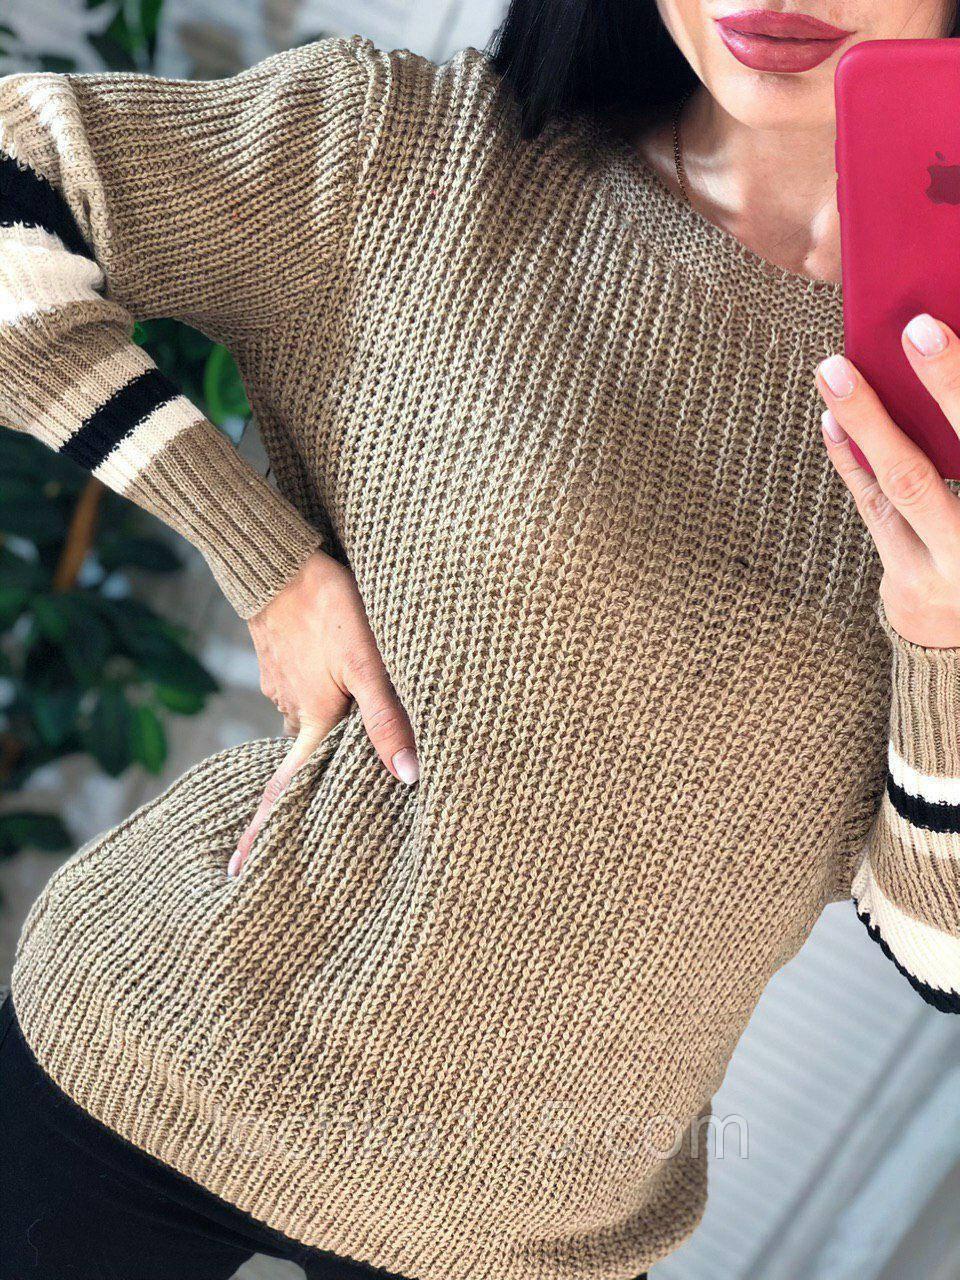 Теплый мягкий женский свитер 42-46 рр, цвет беж